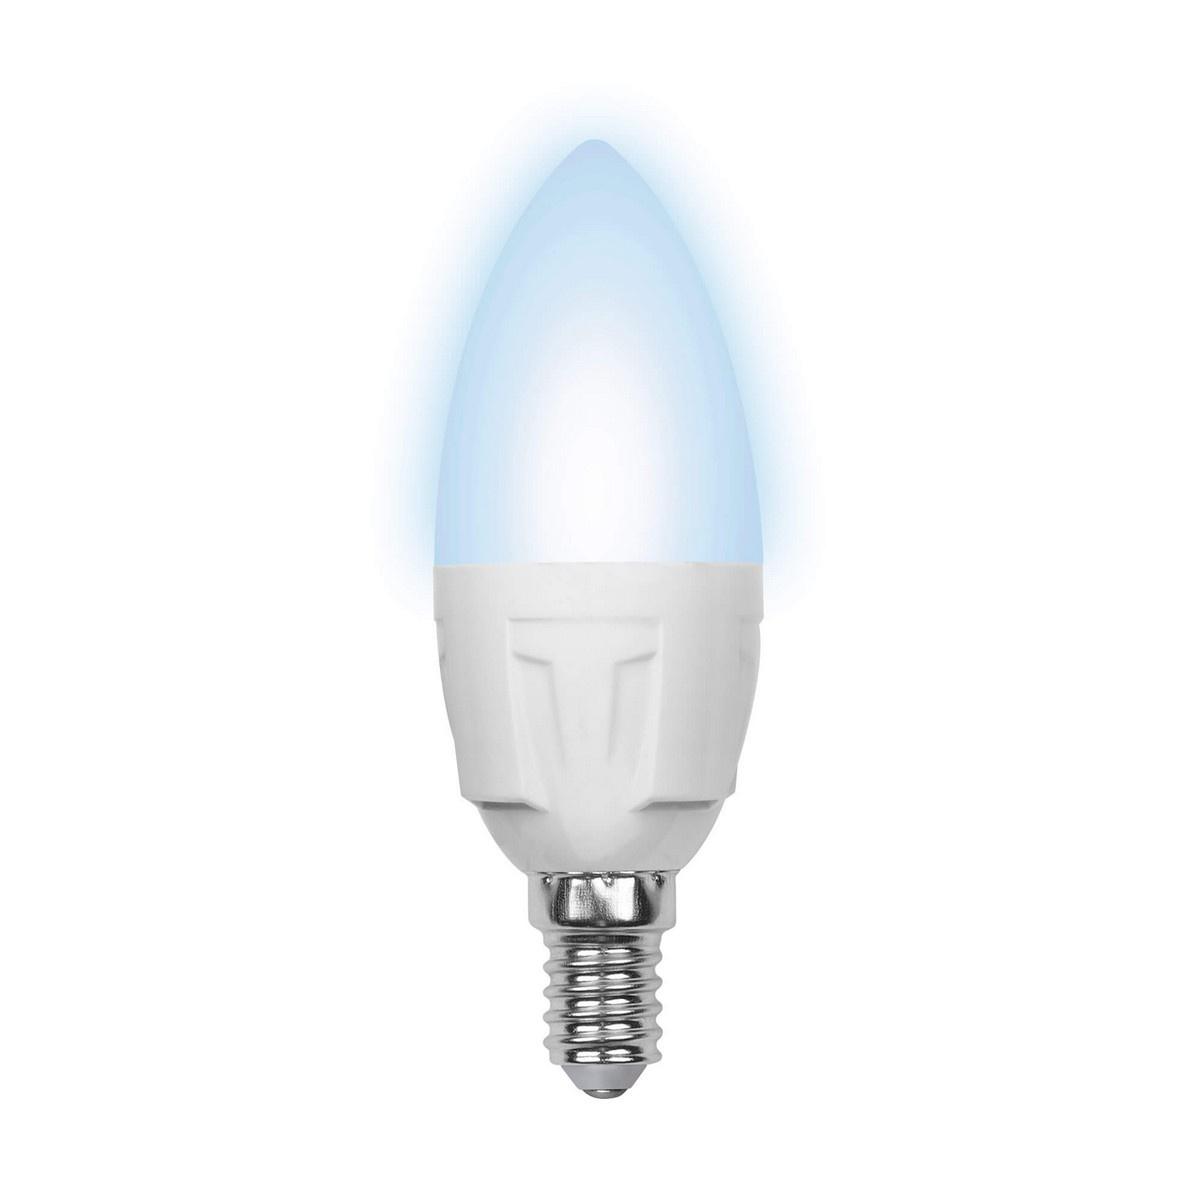 цена на Лампа светодиодная (09454) E14 6W 4500K матовая LED-C37-6W/NW/E14/FR/S